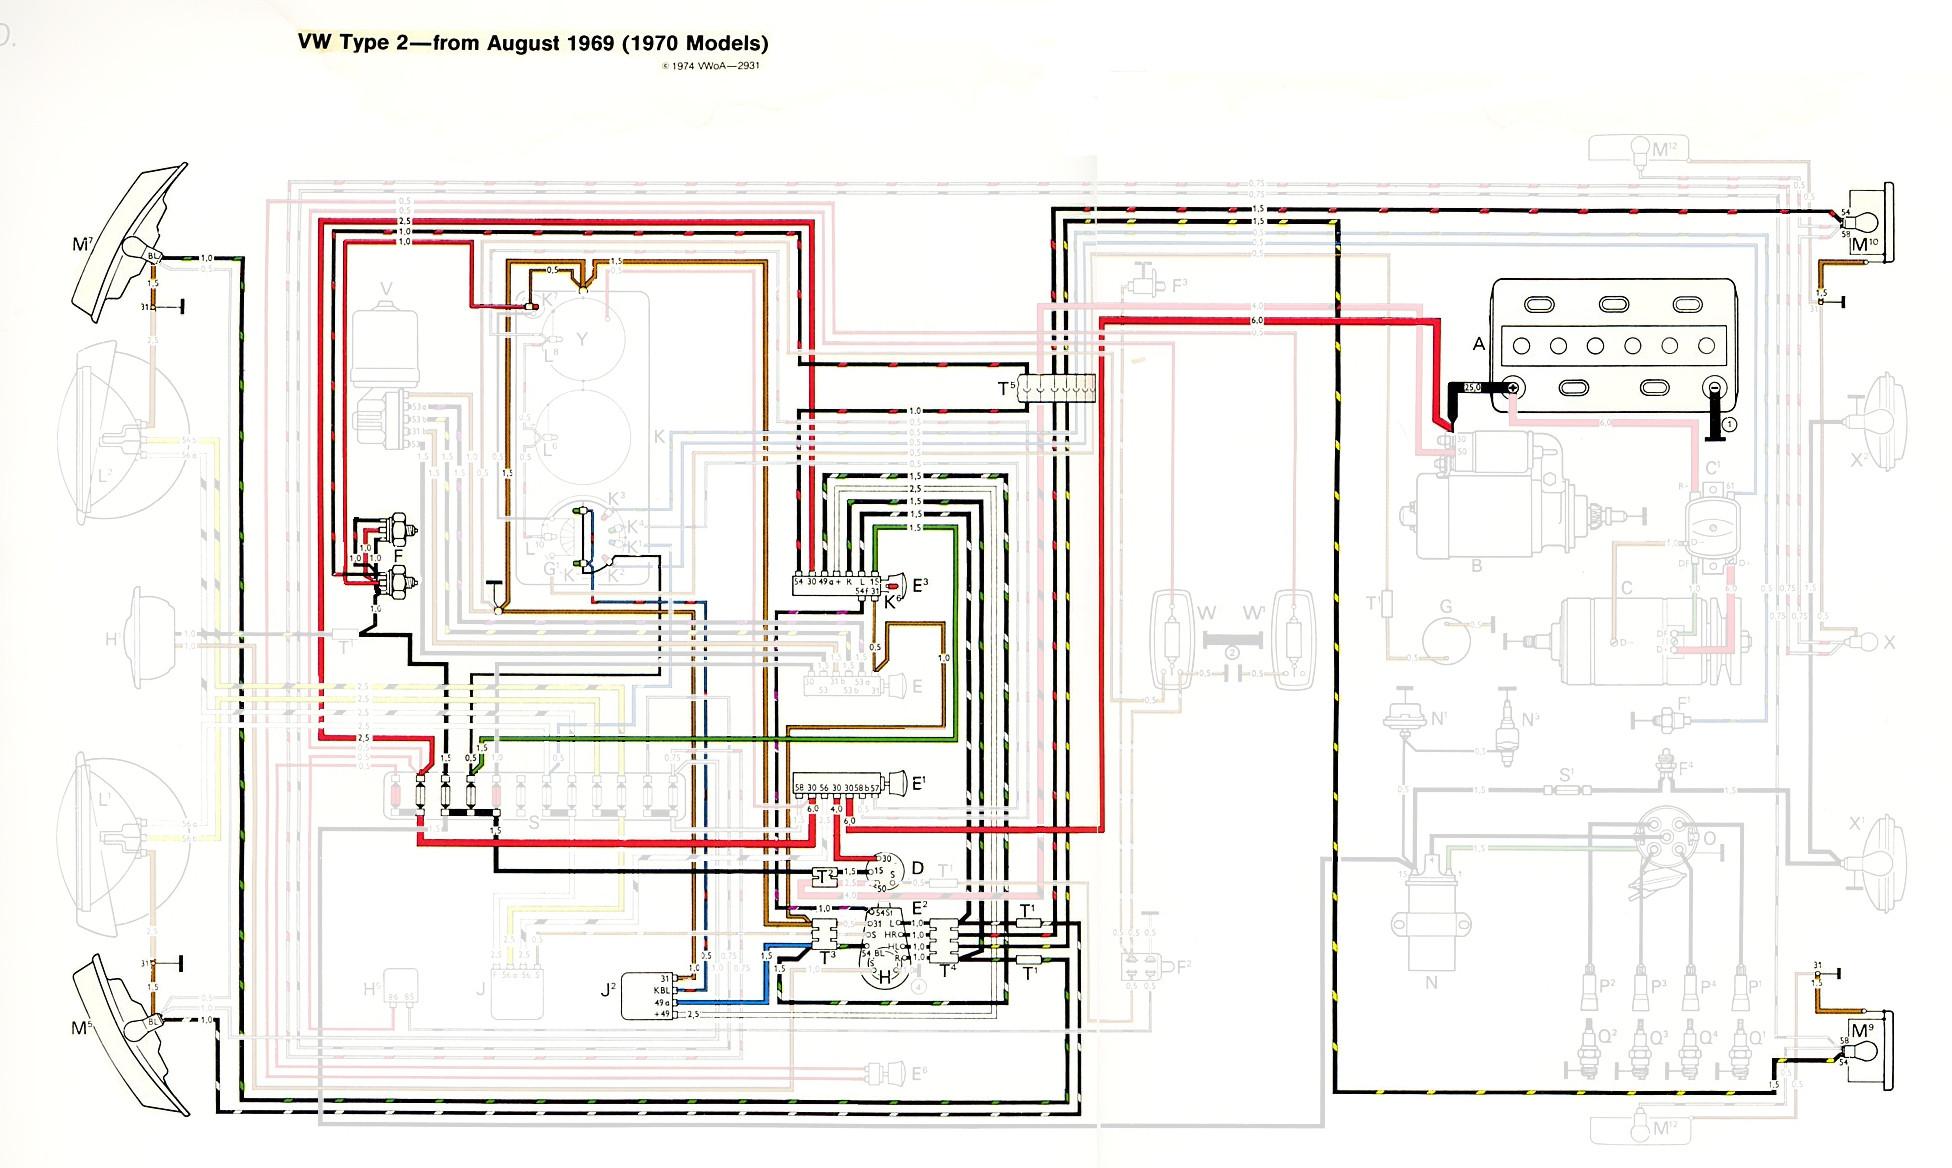 Dc 4433 Thomas Built C2 Bus Wiring Diagrams Download Diagram